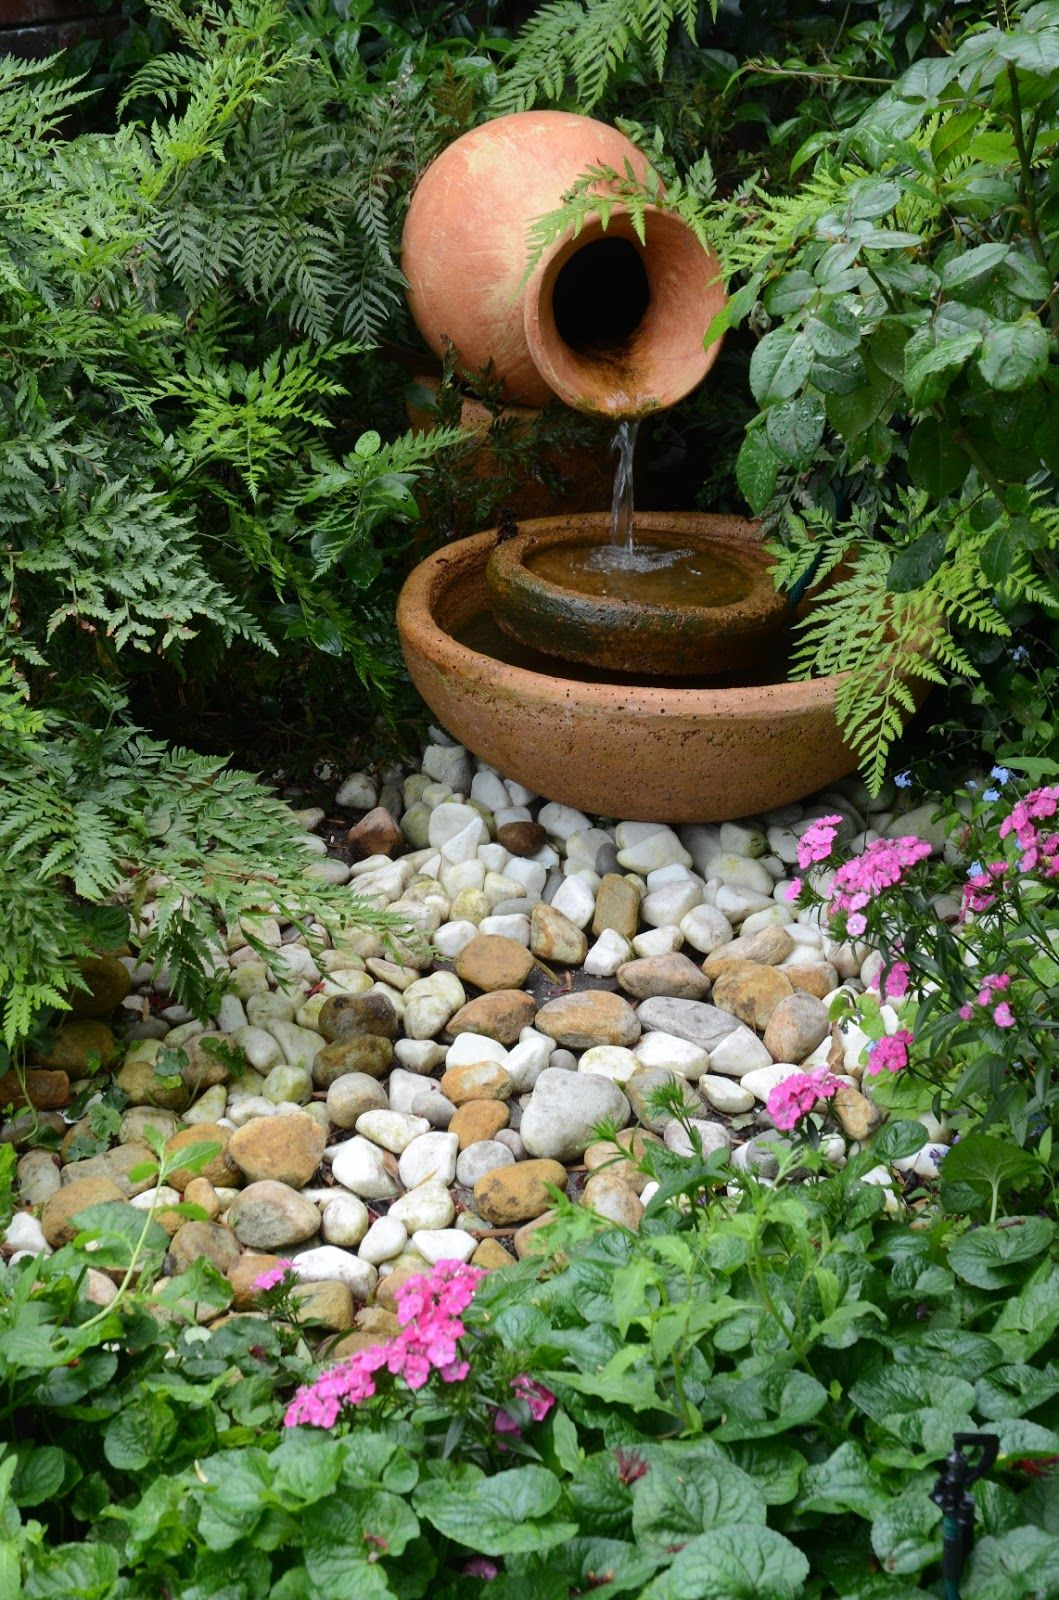 Water Feature | Fonte De Água Faça Você Mesmo, Belos Jardins ... tout Pot En Fonte Pour Jardin